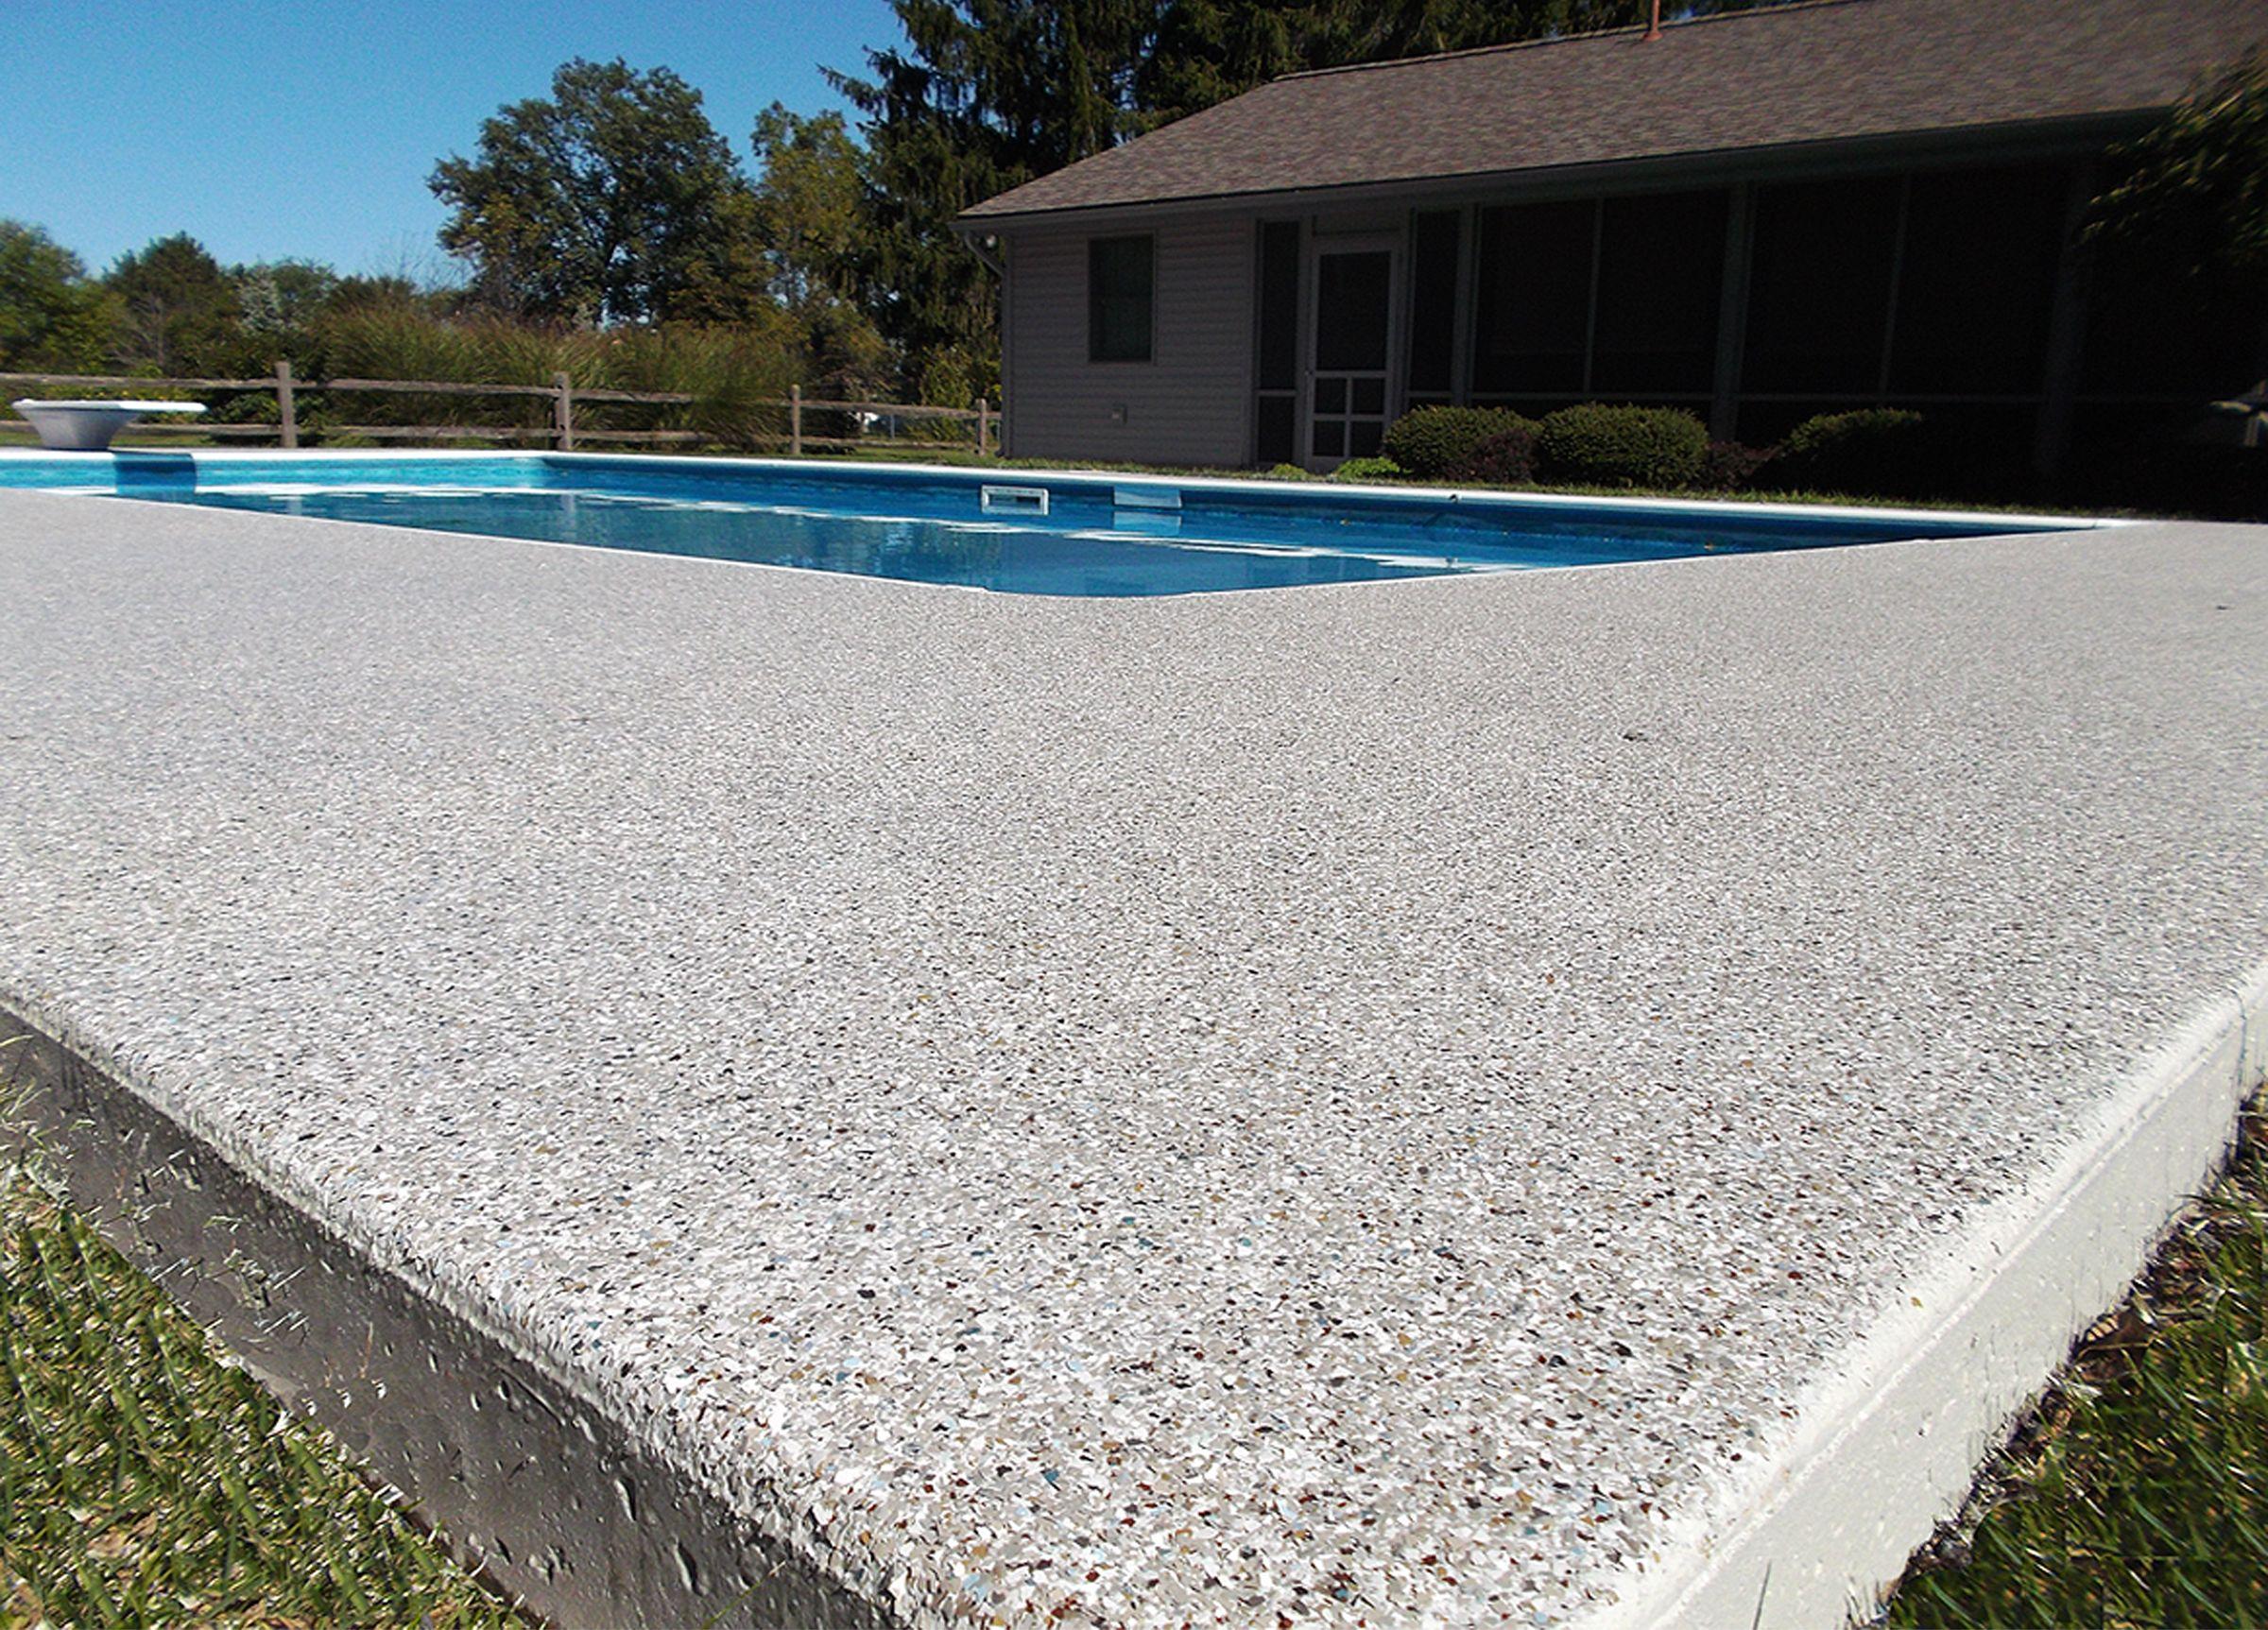 pool deck overlay that will repair